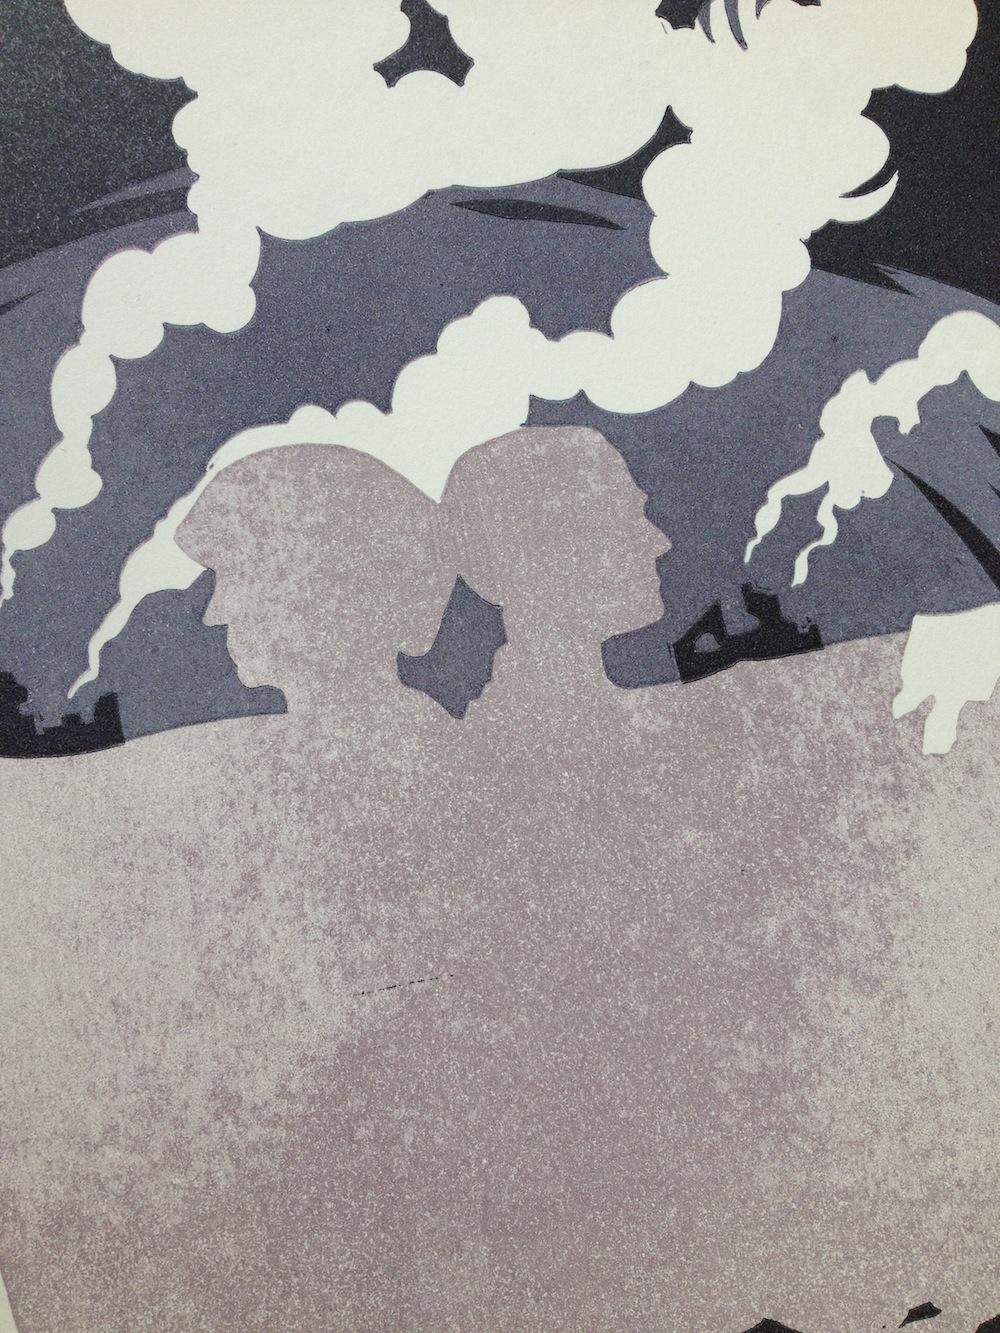 Linocut illustration detail